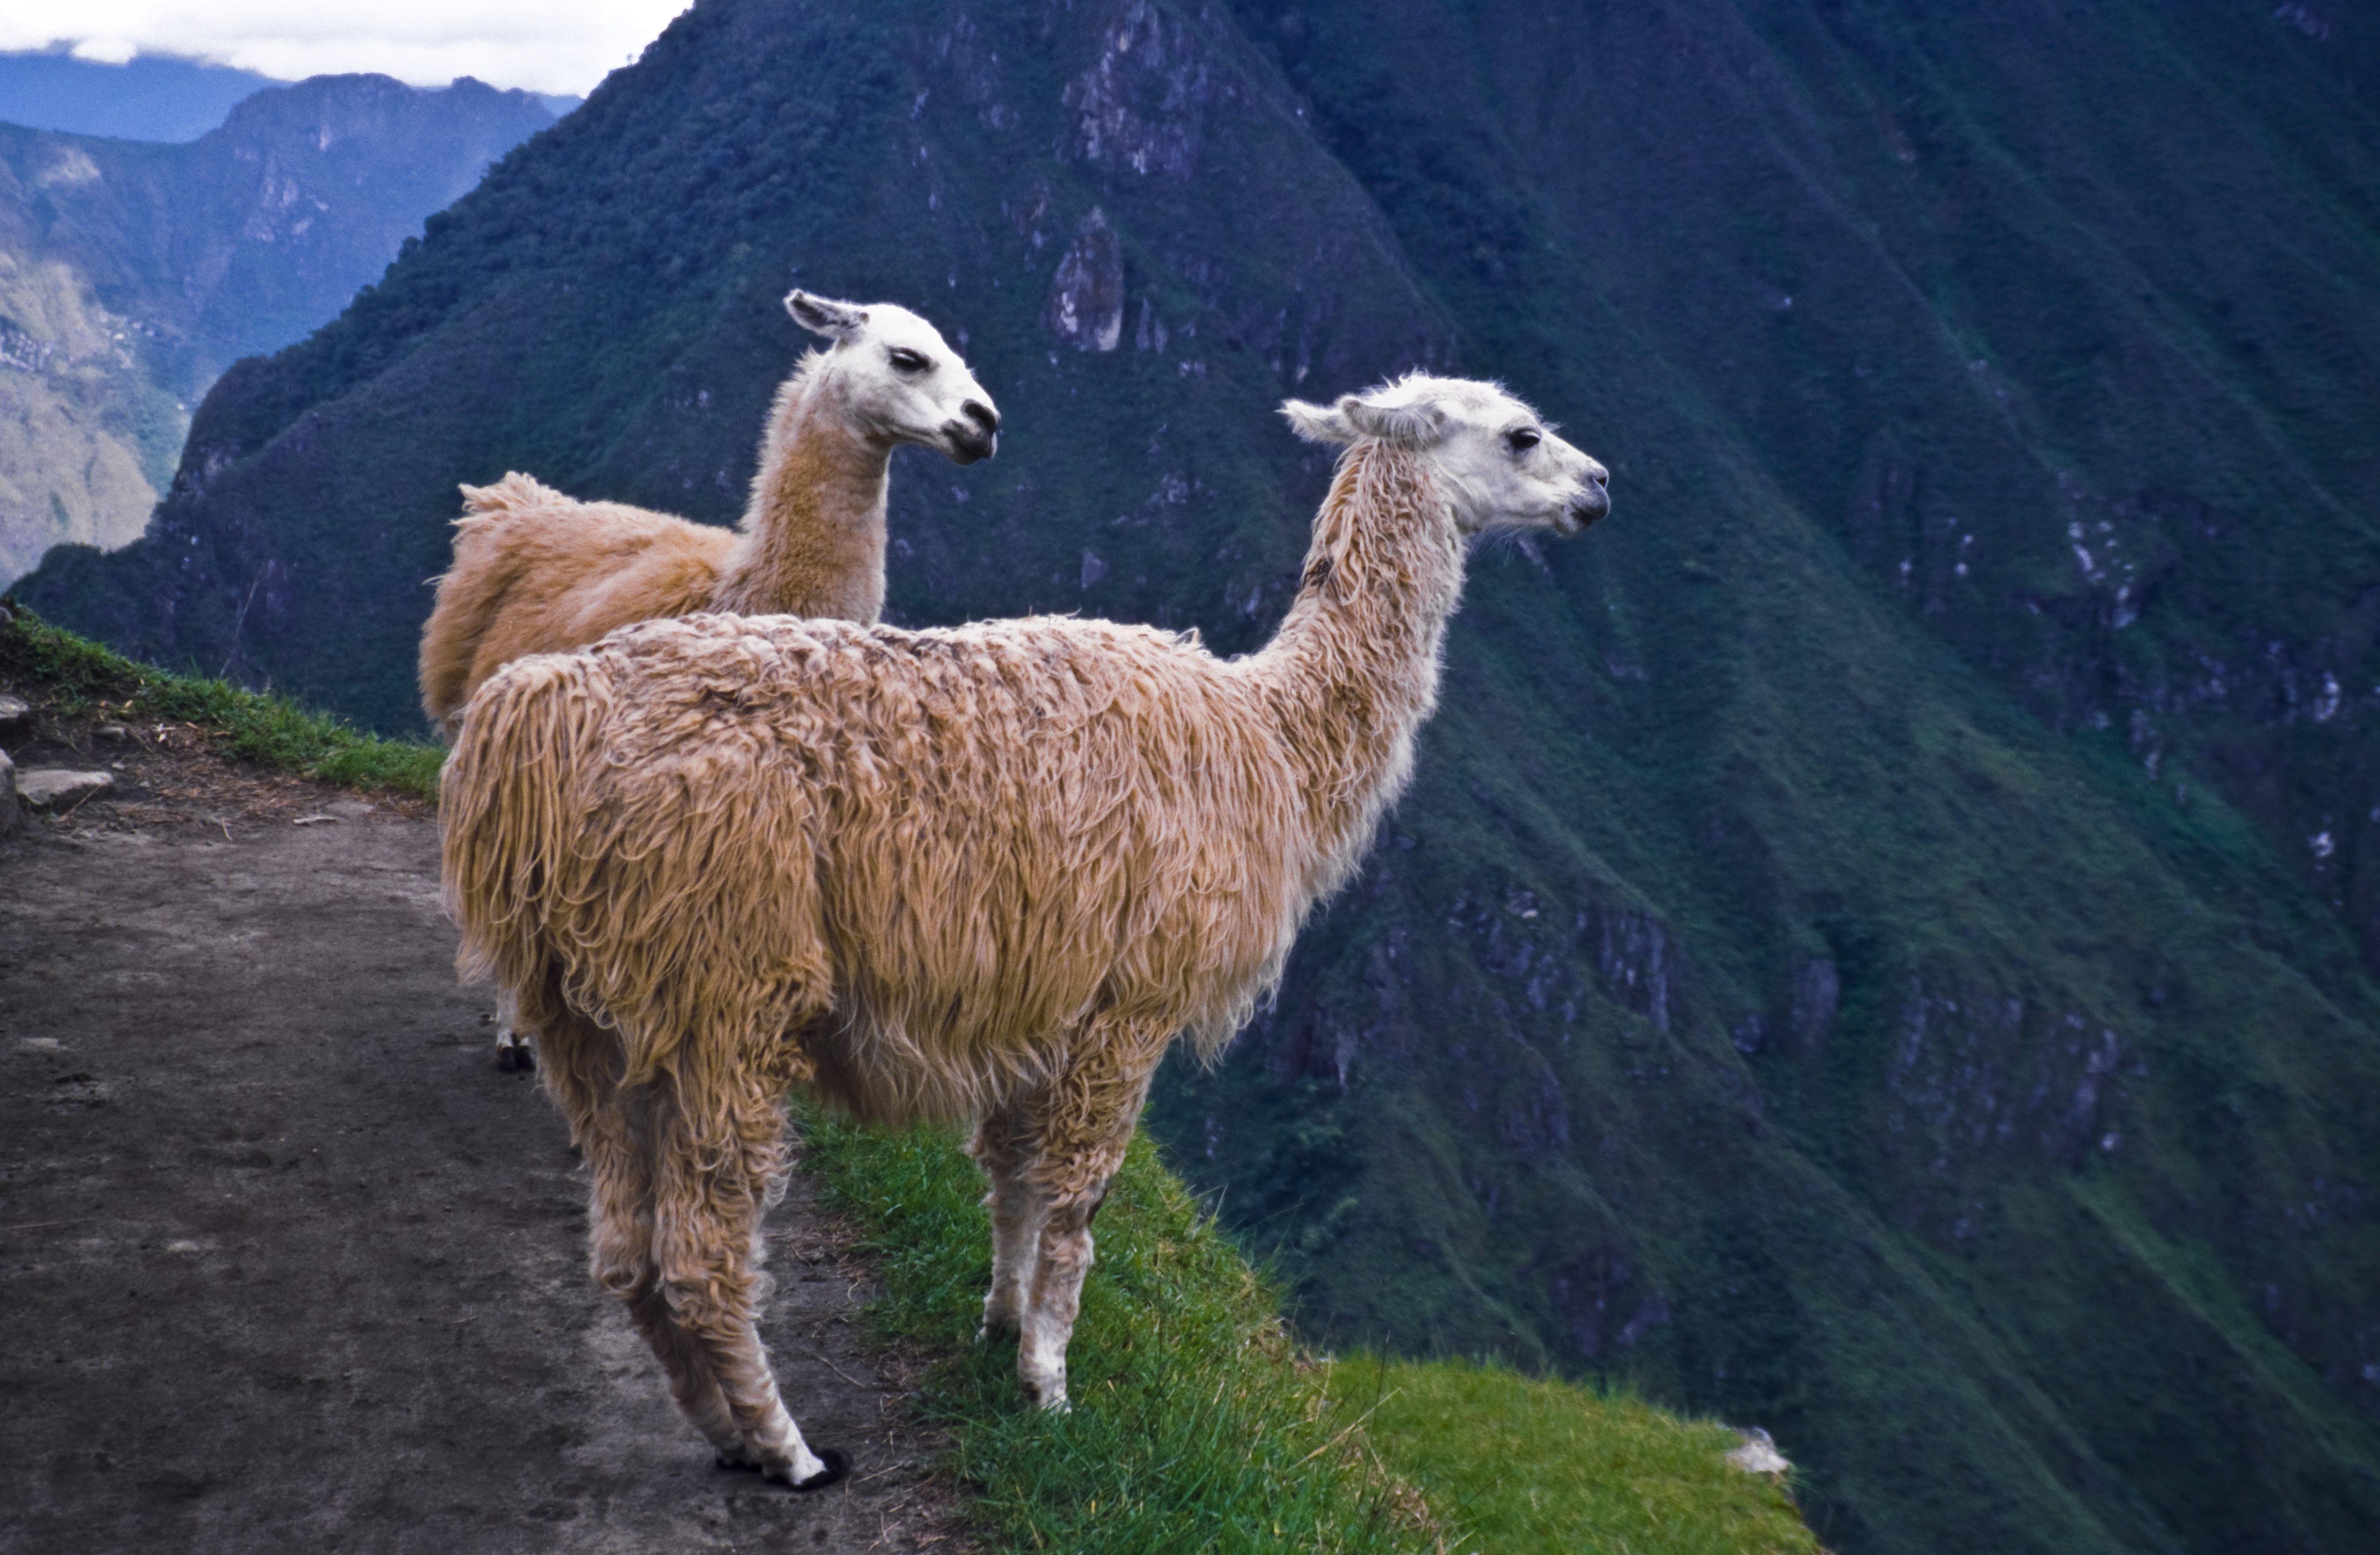 A Guide To Llamas Alpacas Guanacos And Vicunas